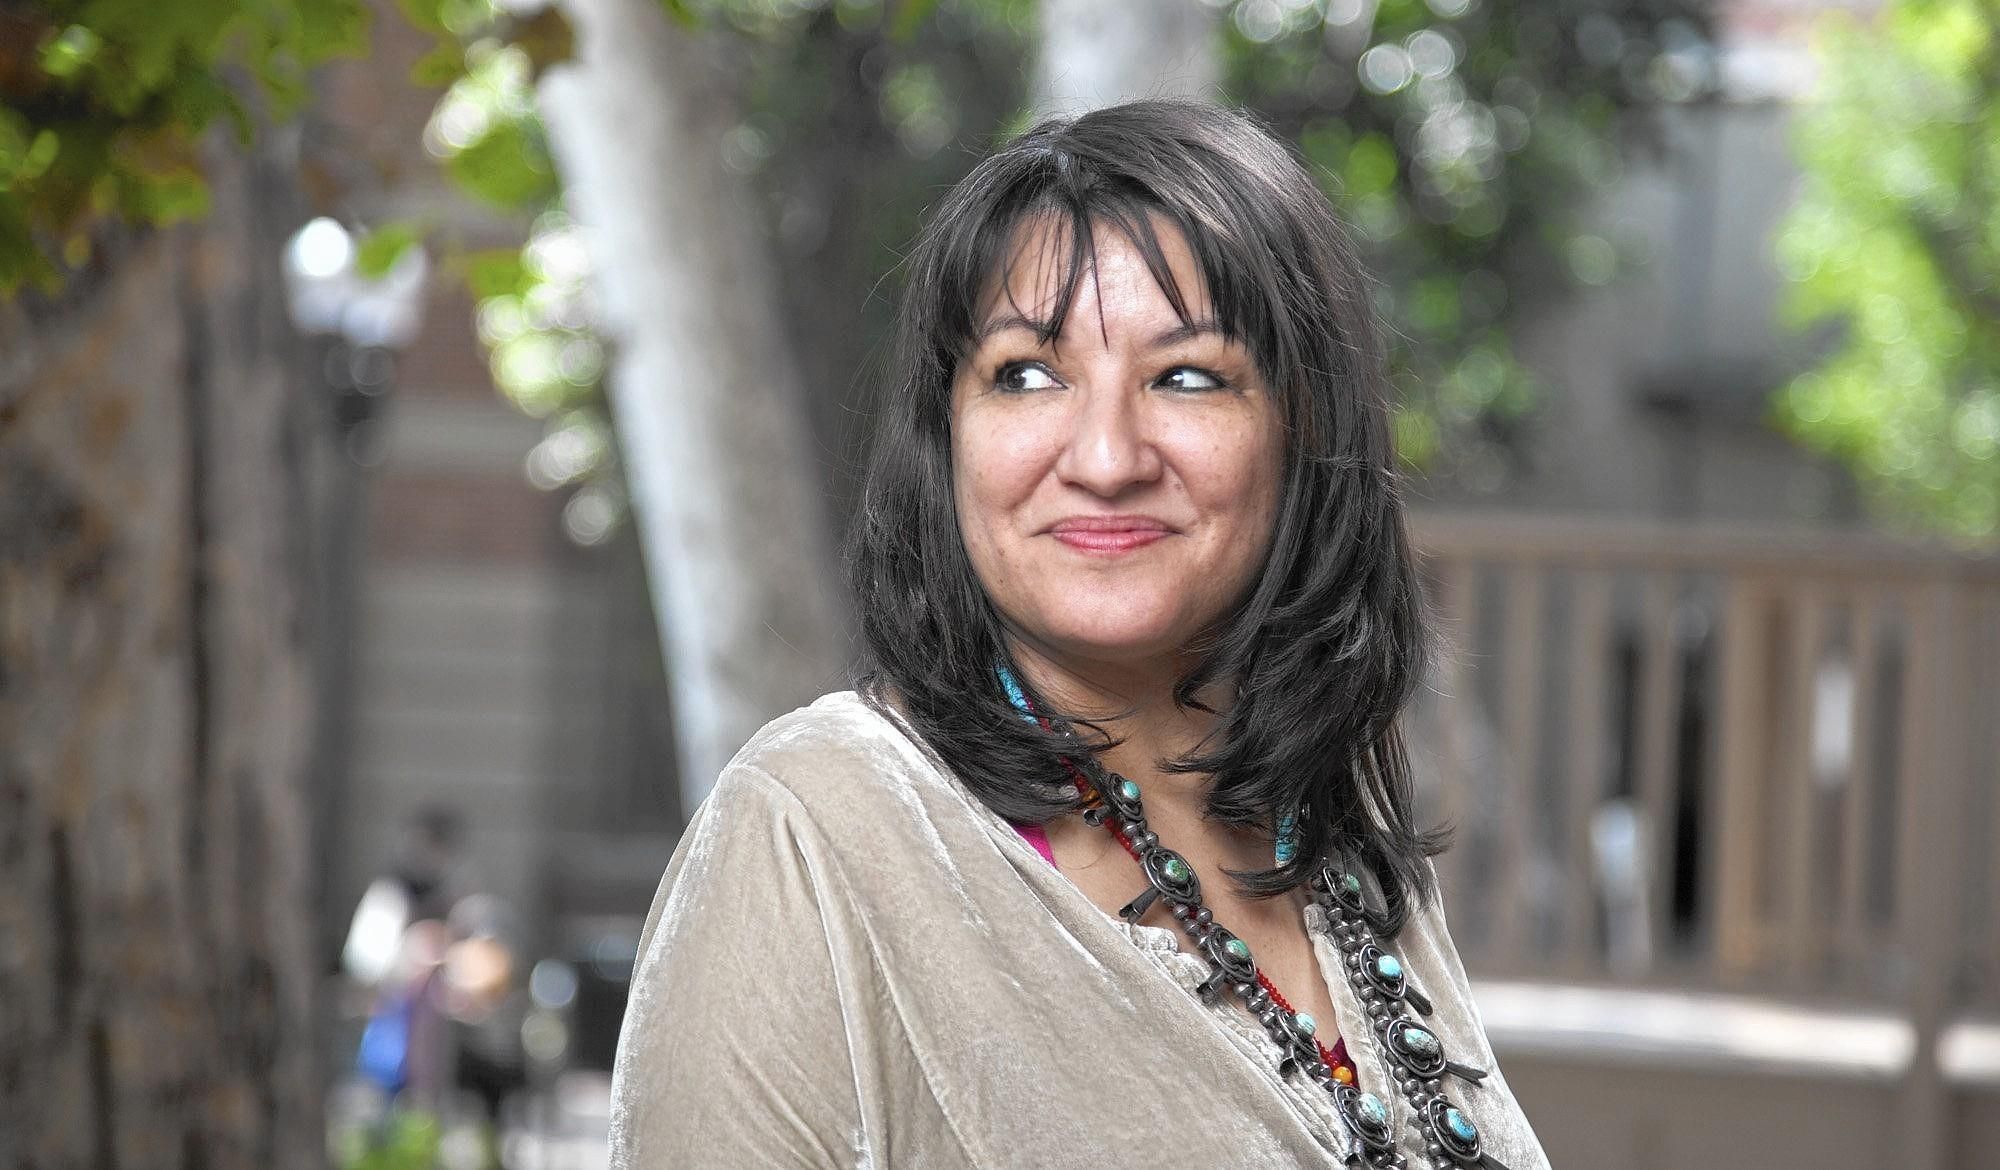 WOMAN HOLLERING CREEK by Sandra Cisneros | Review